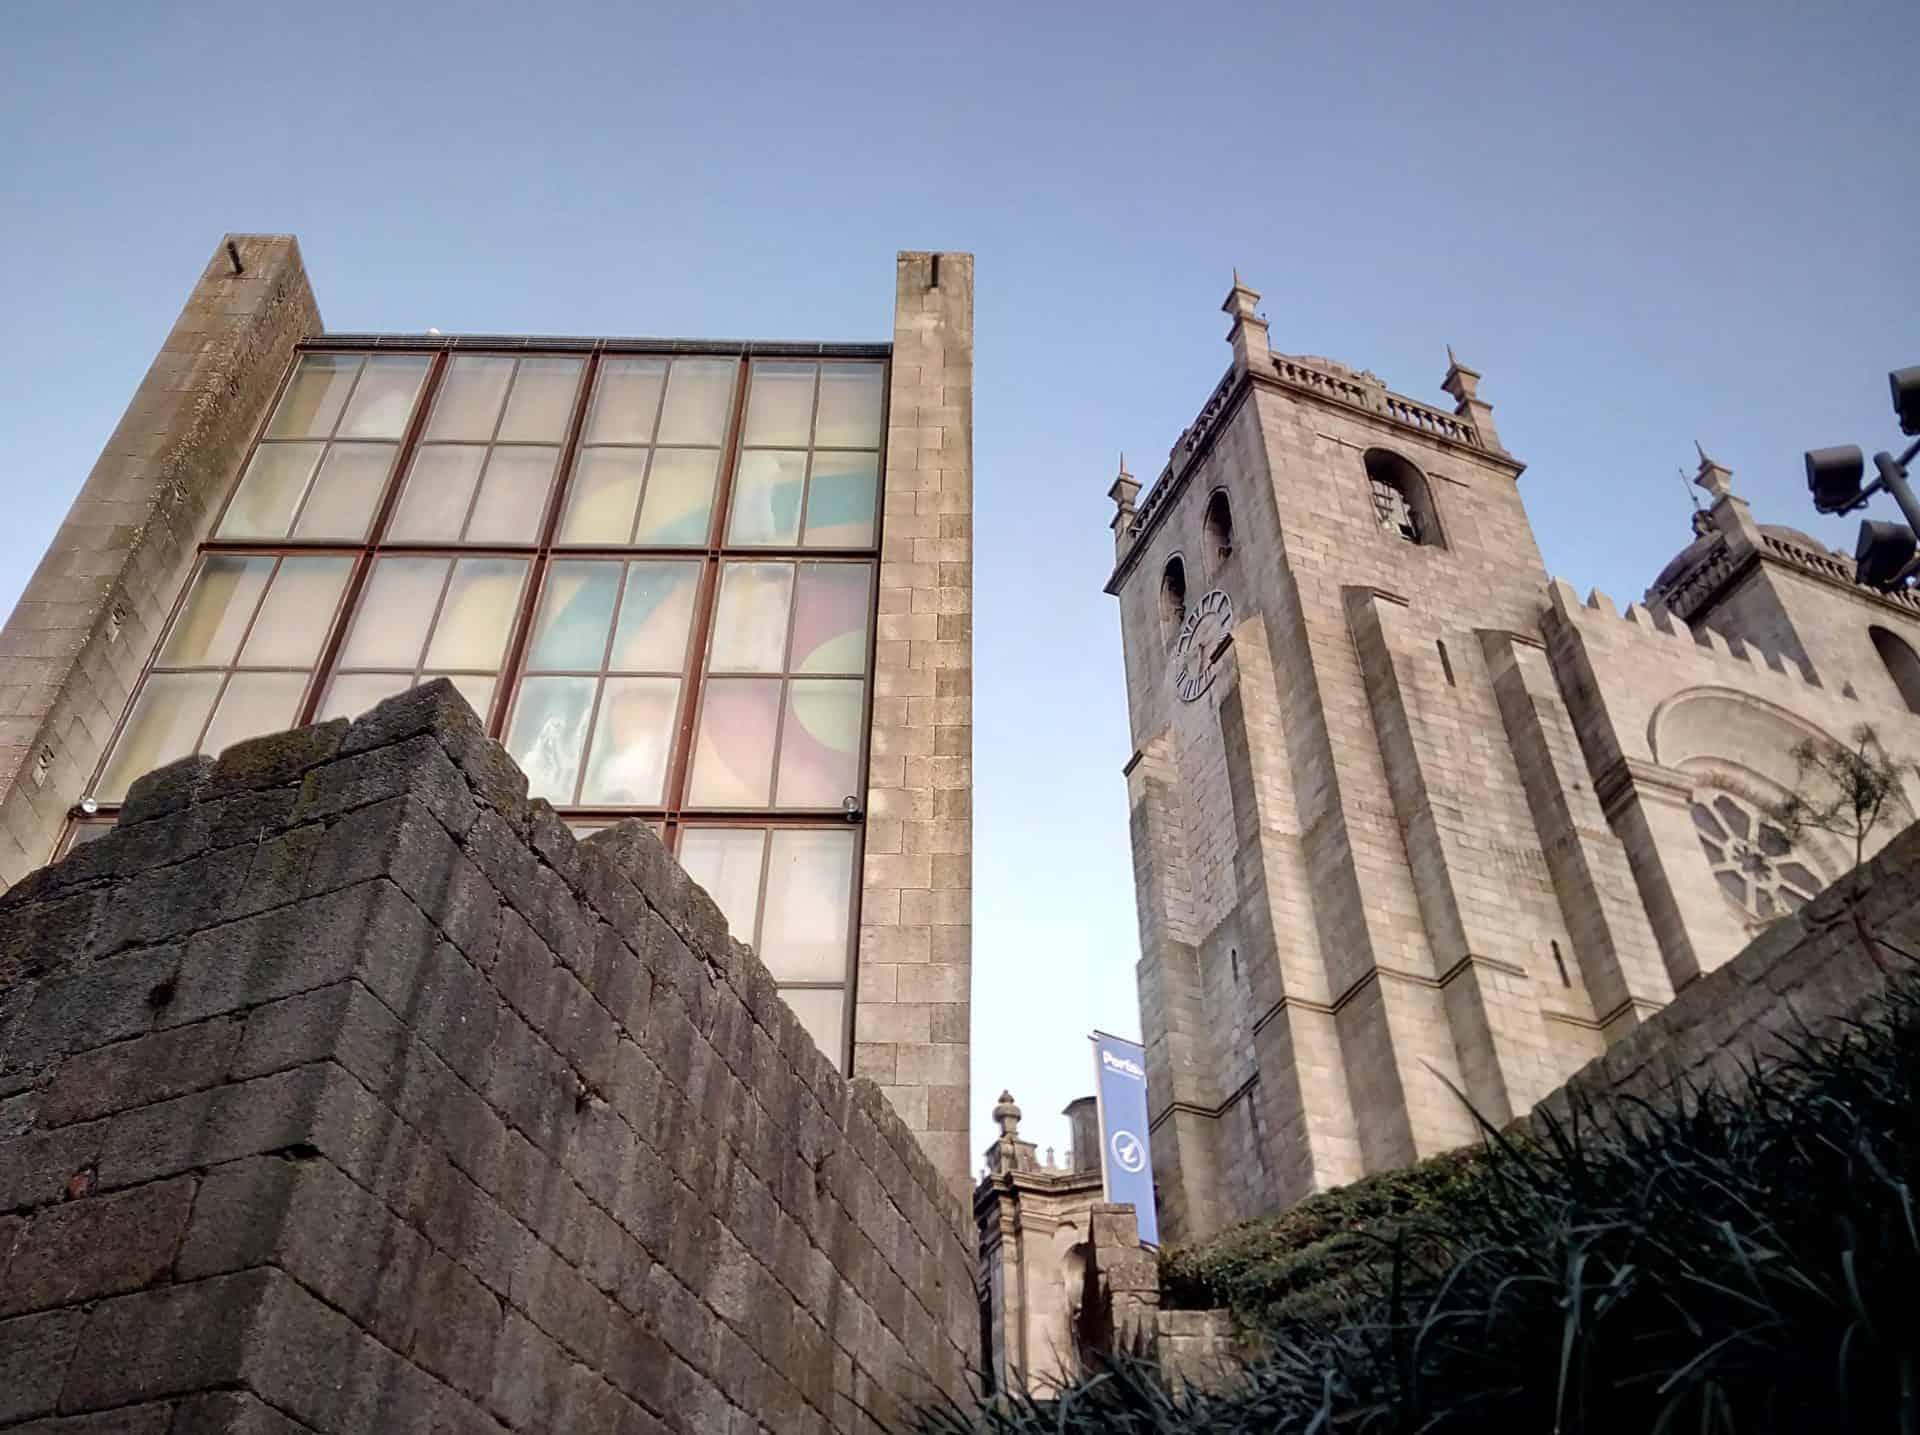 Porto_tourpoint3_house24_newmaterials_2